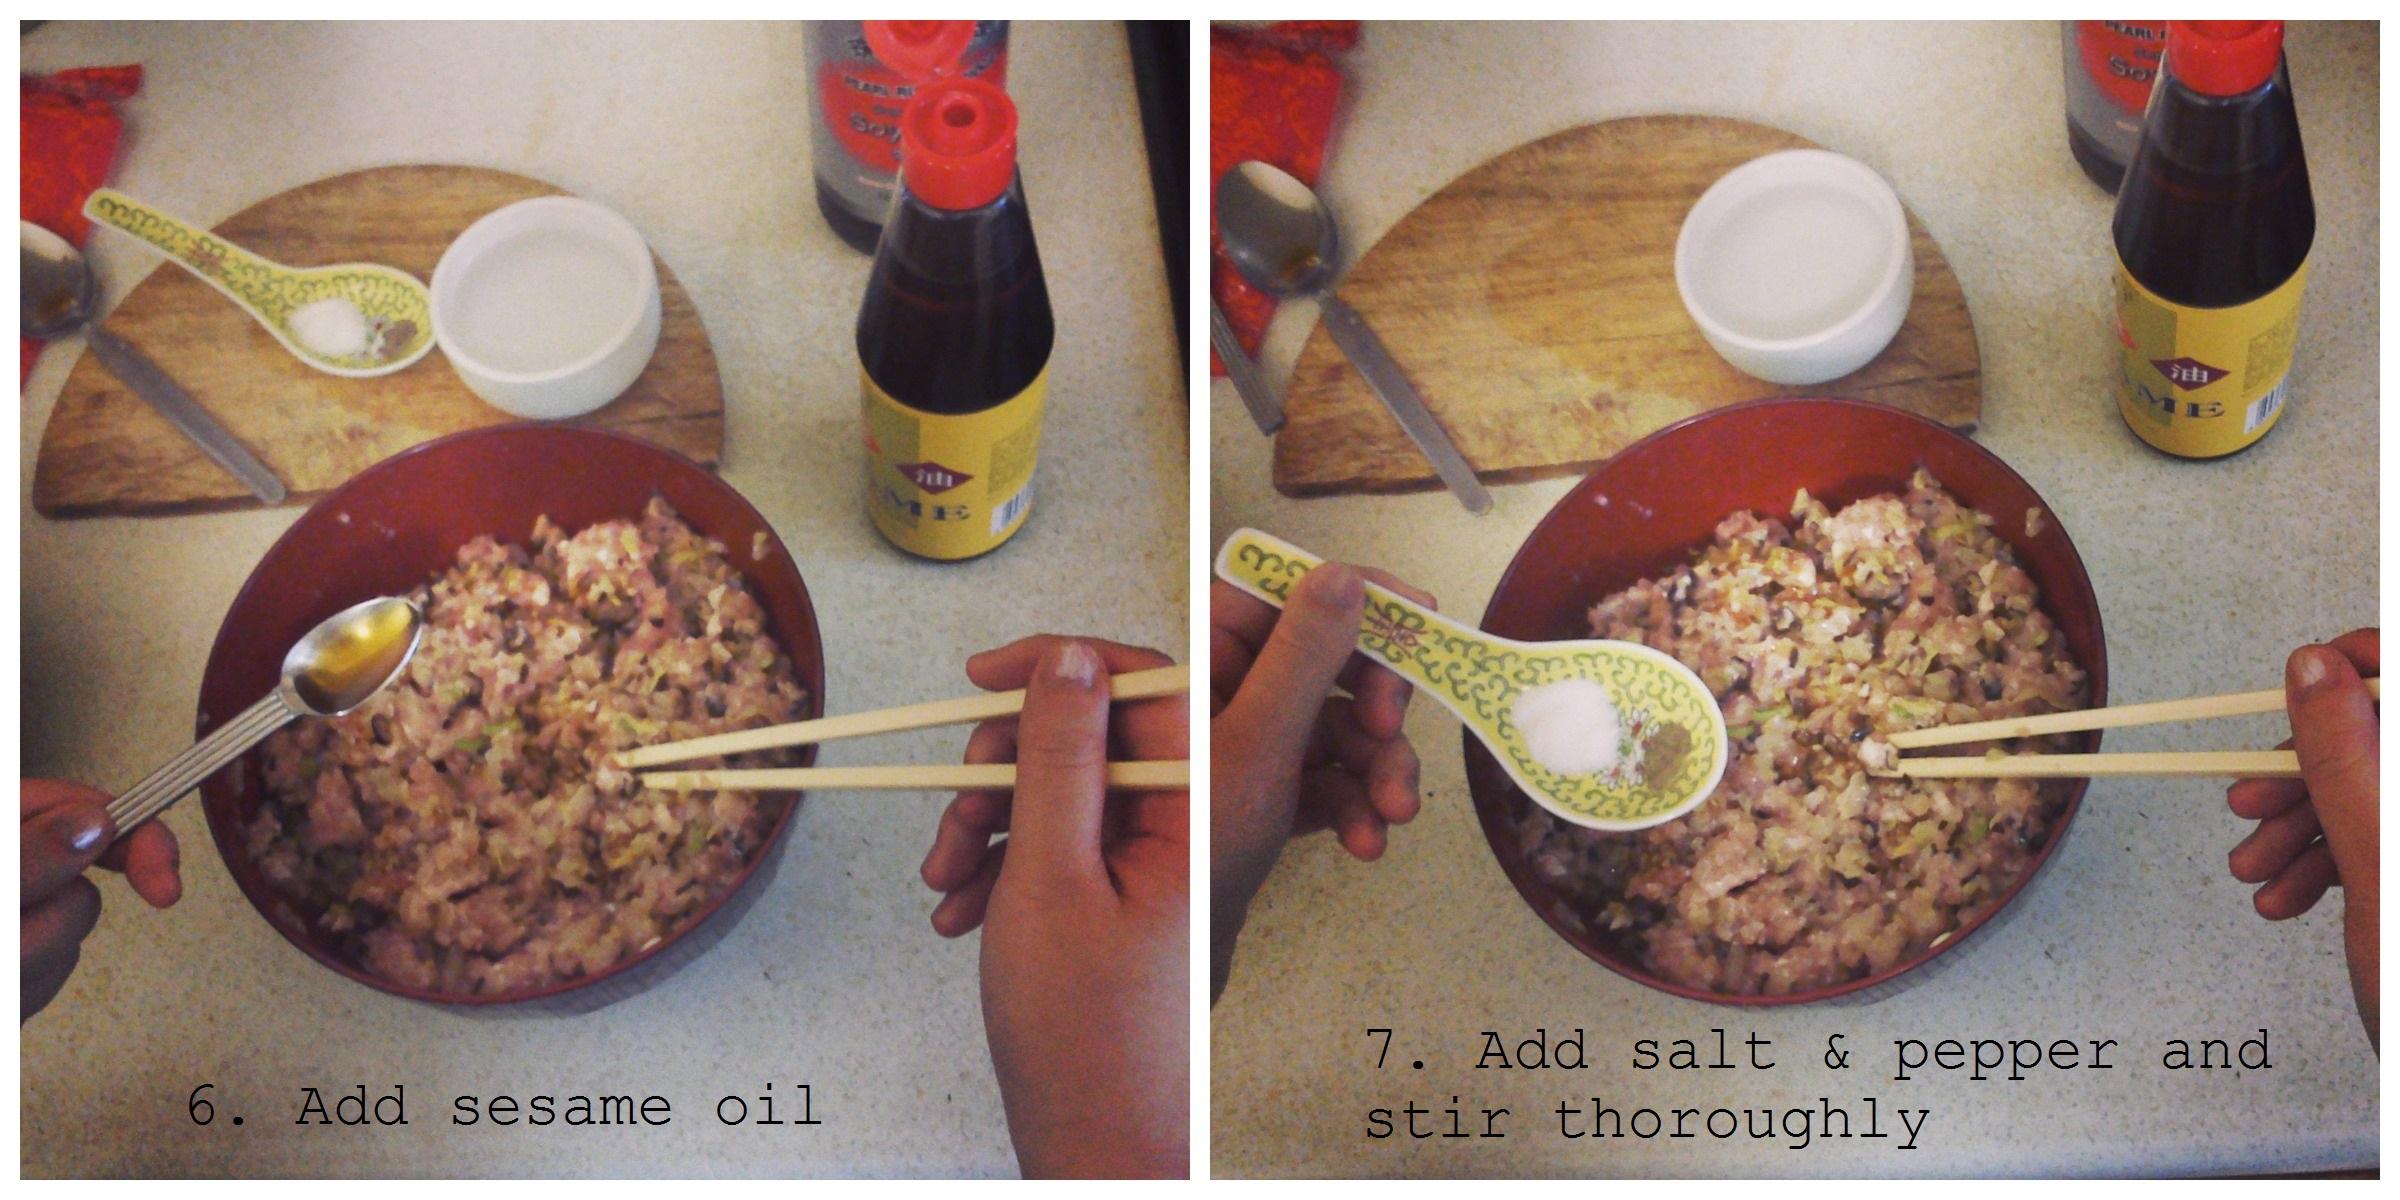 Dumpling Collage2.jpg